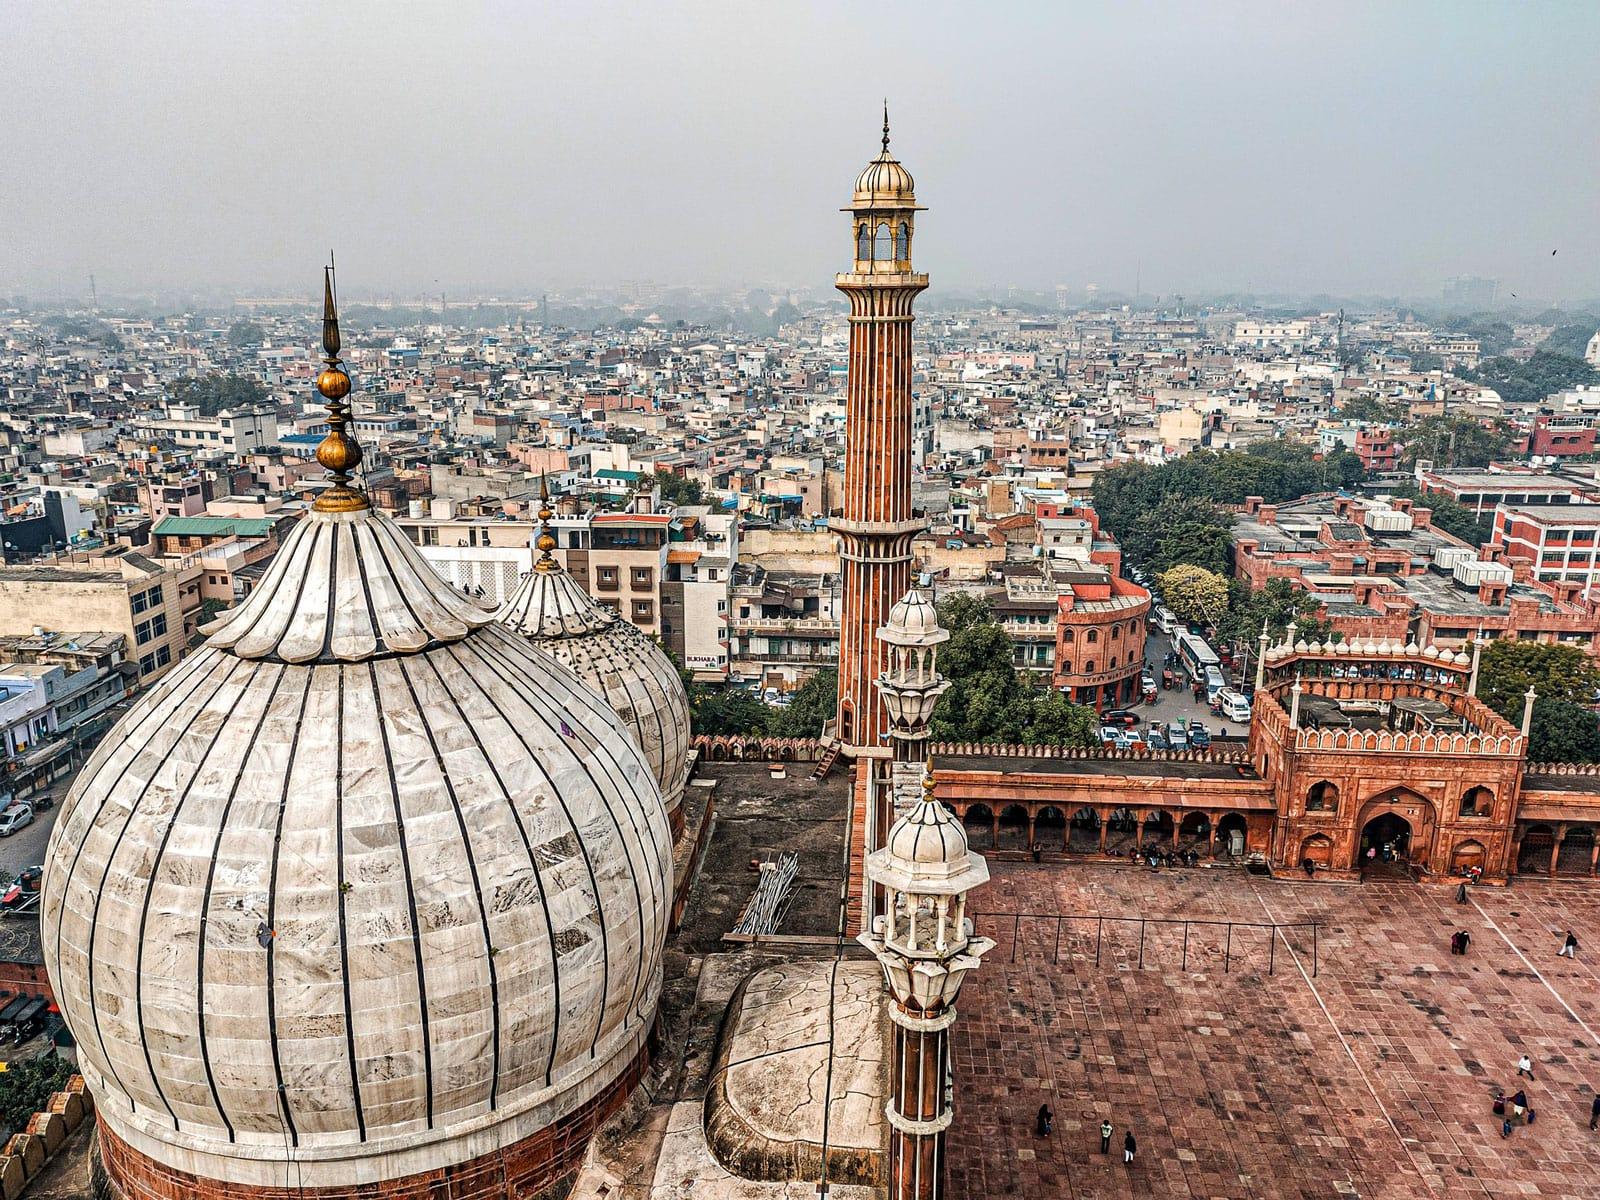 rondreis india delhi hoogtepunt 10